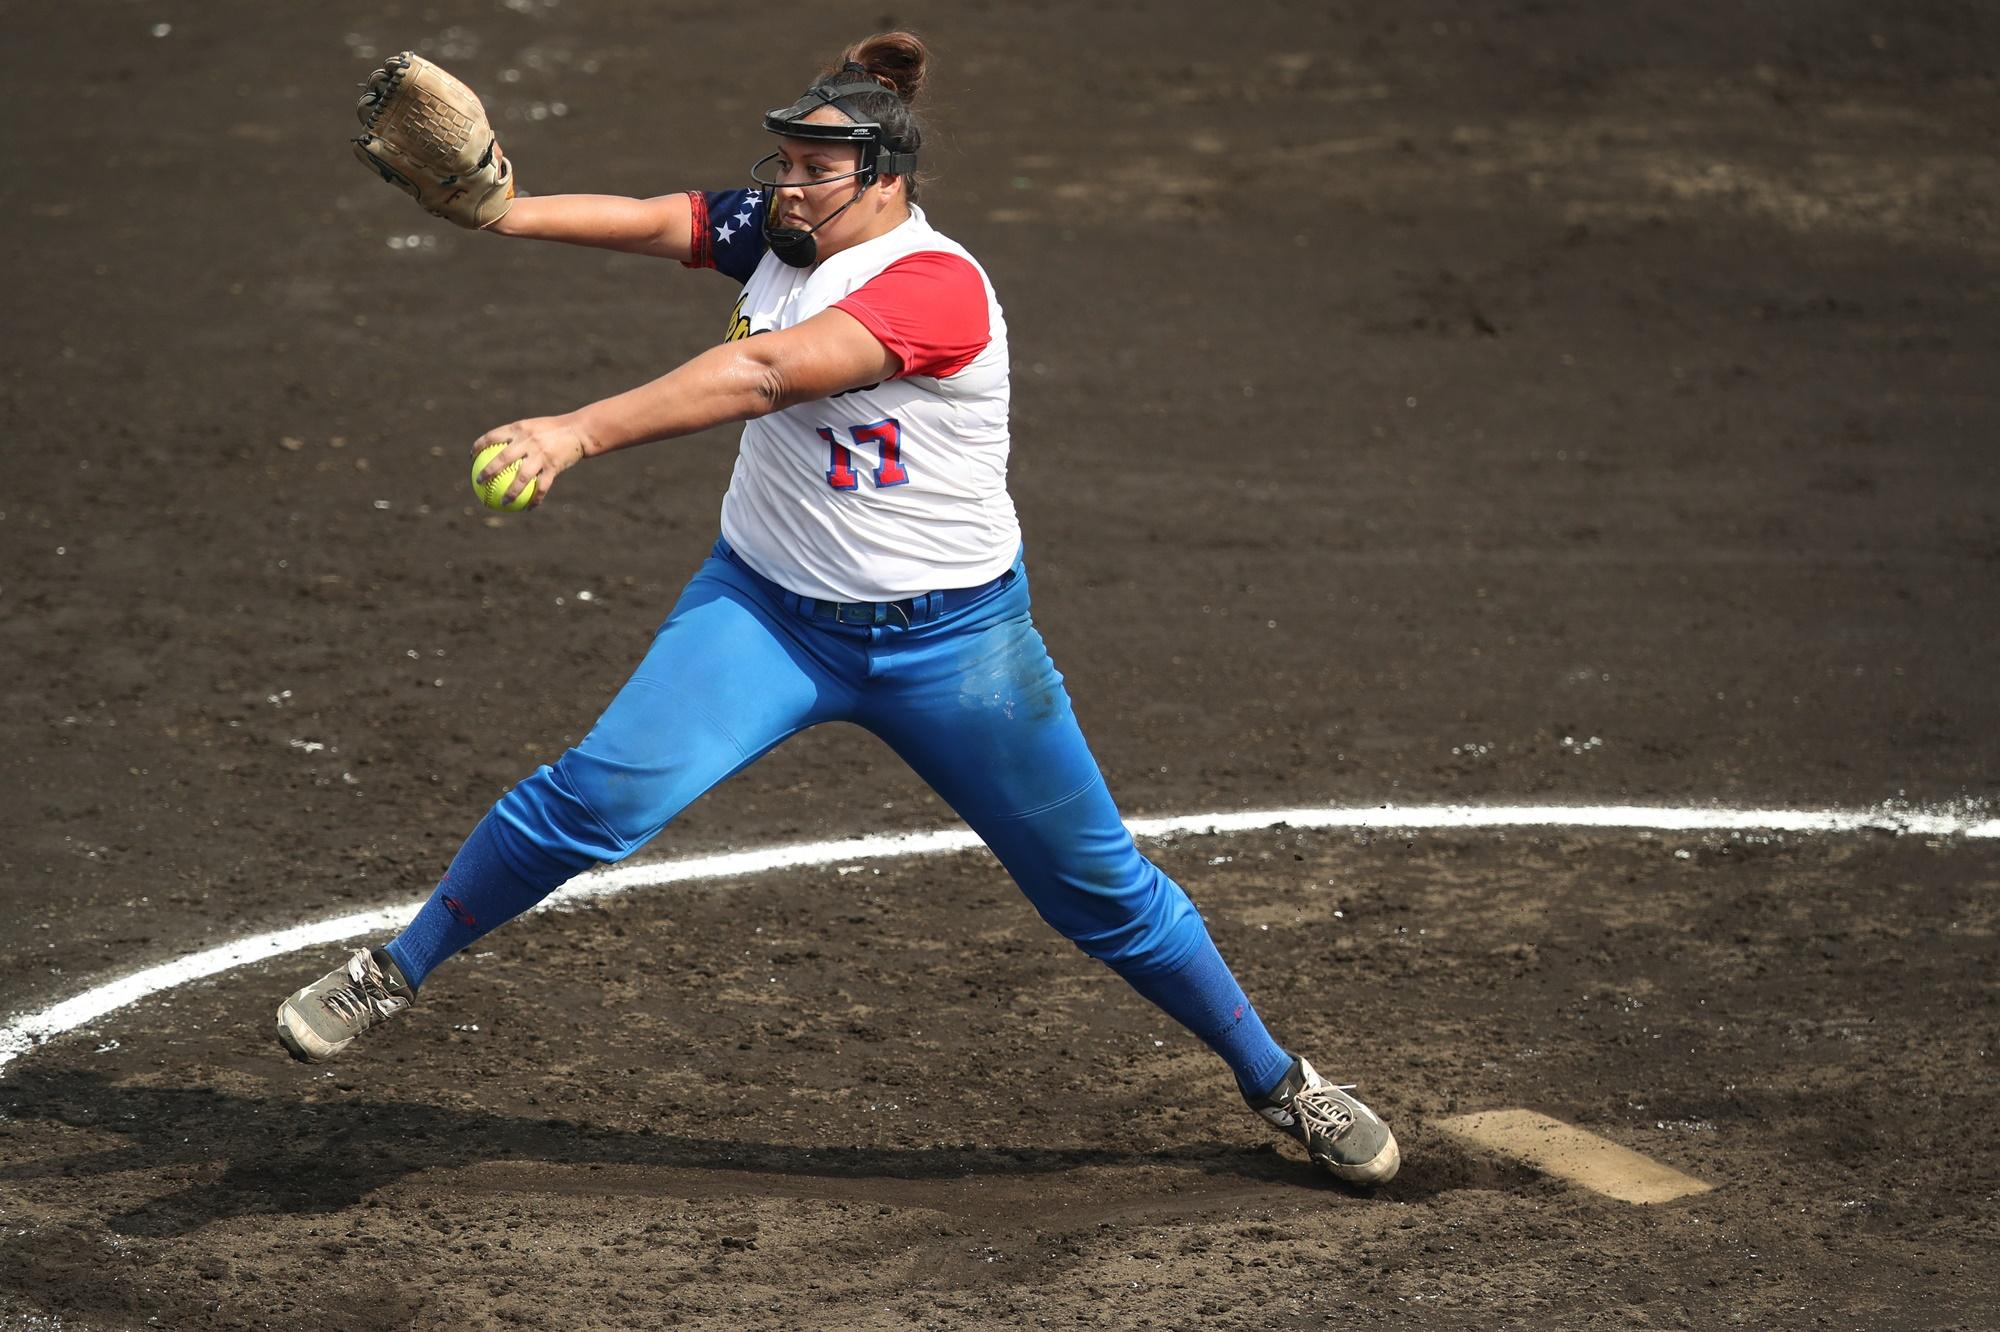 Desiree Ibarra started the game for Venezuela